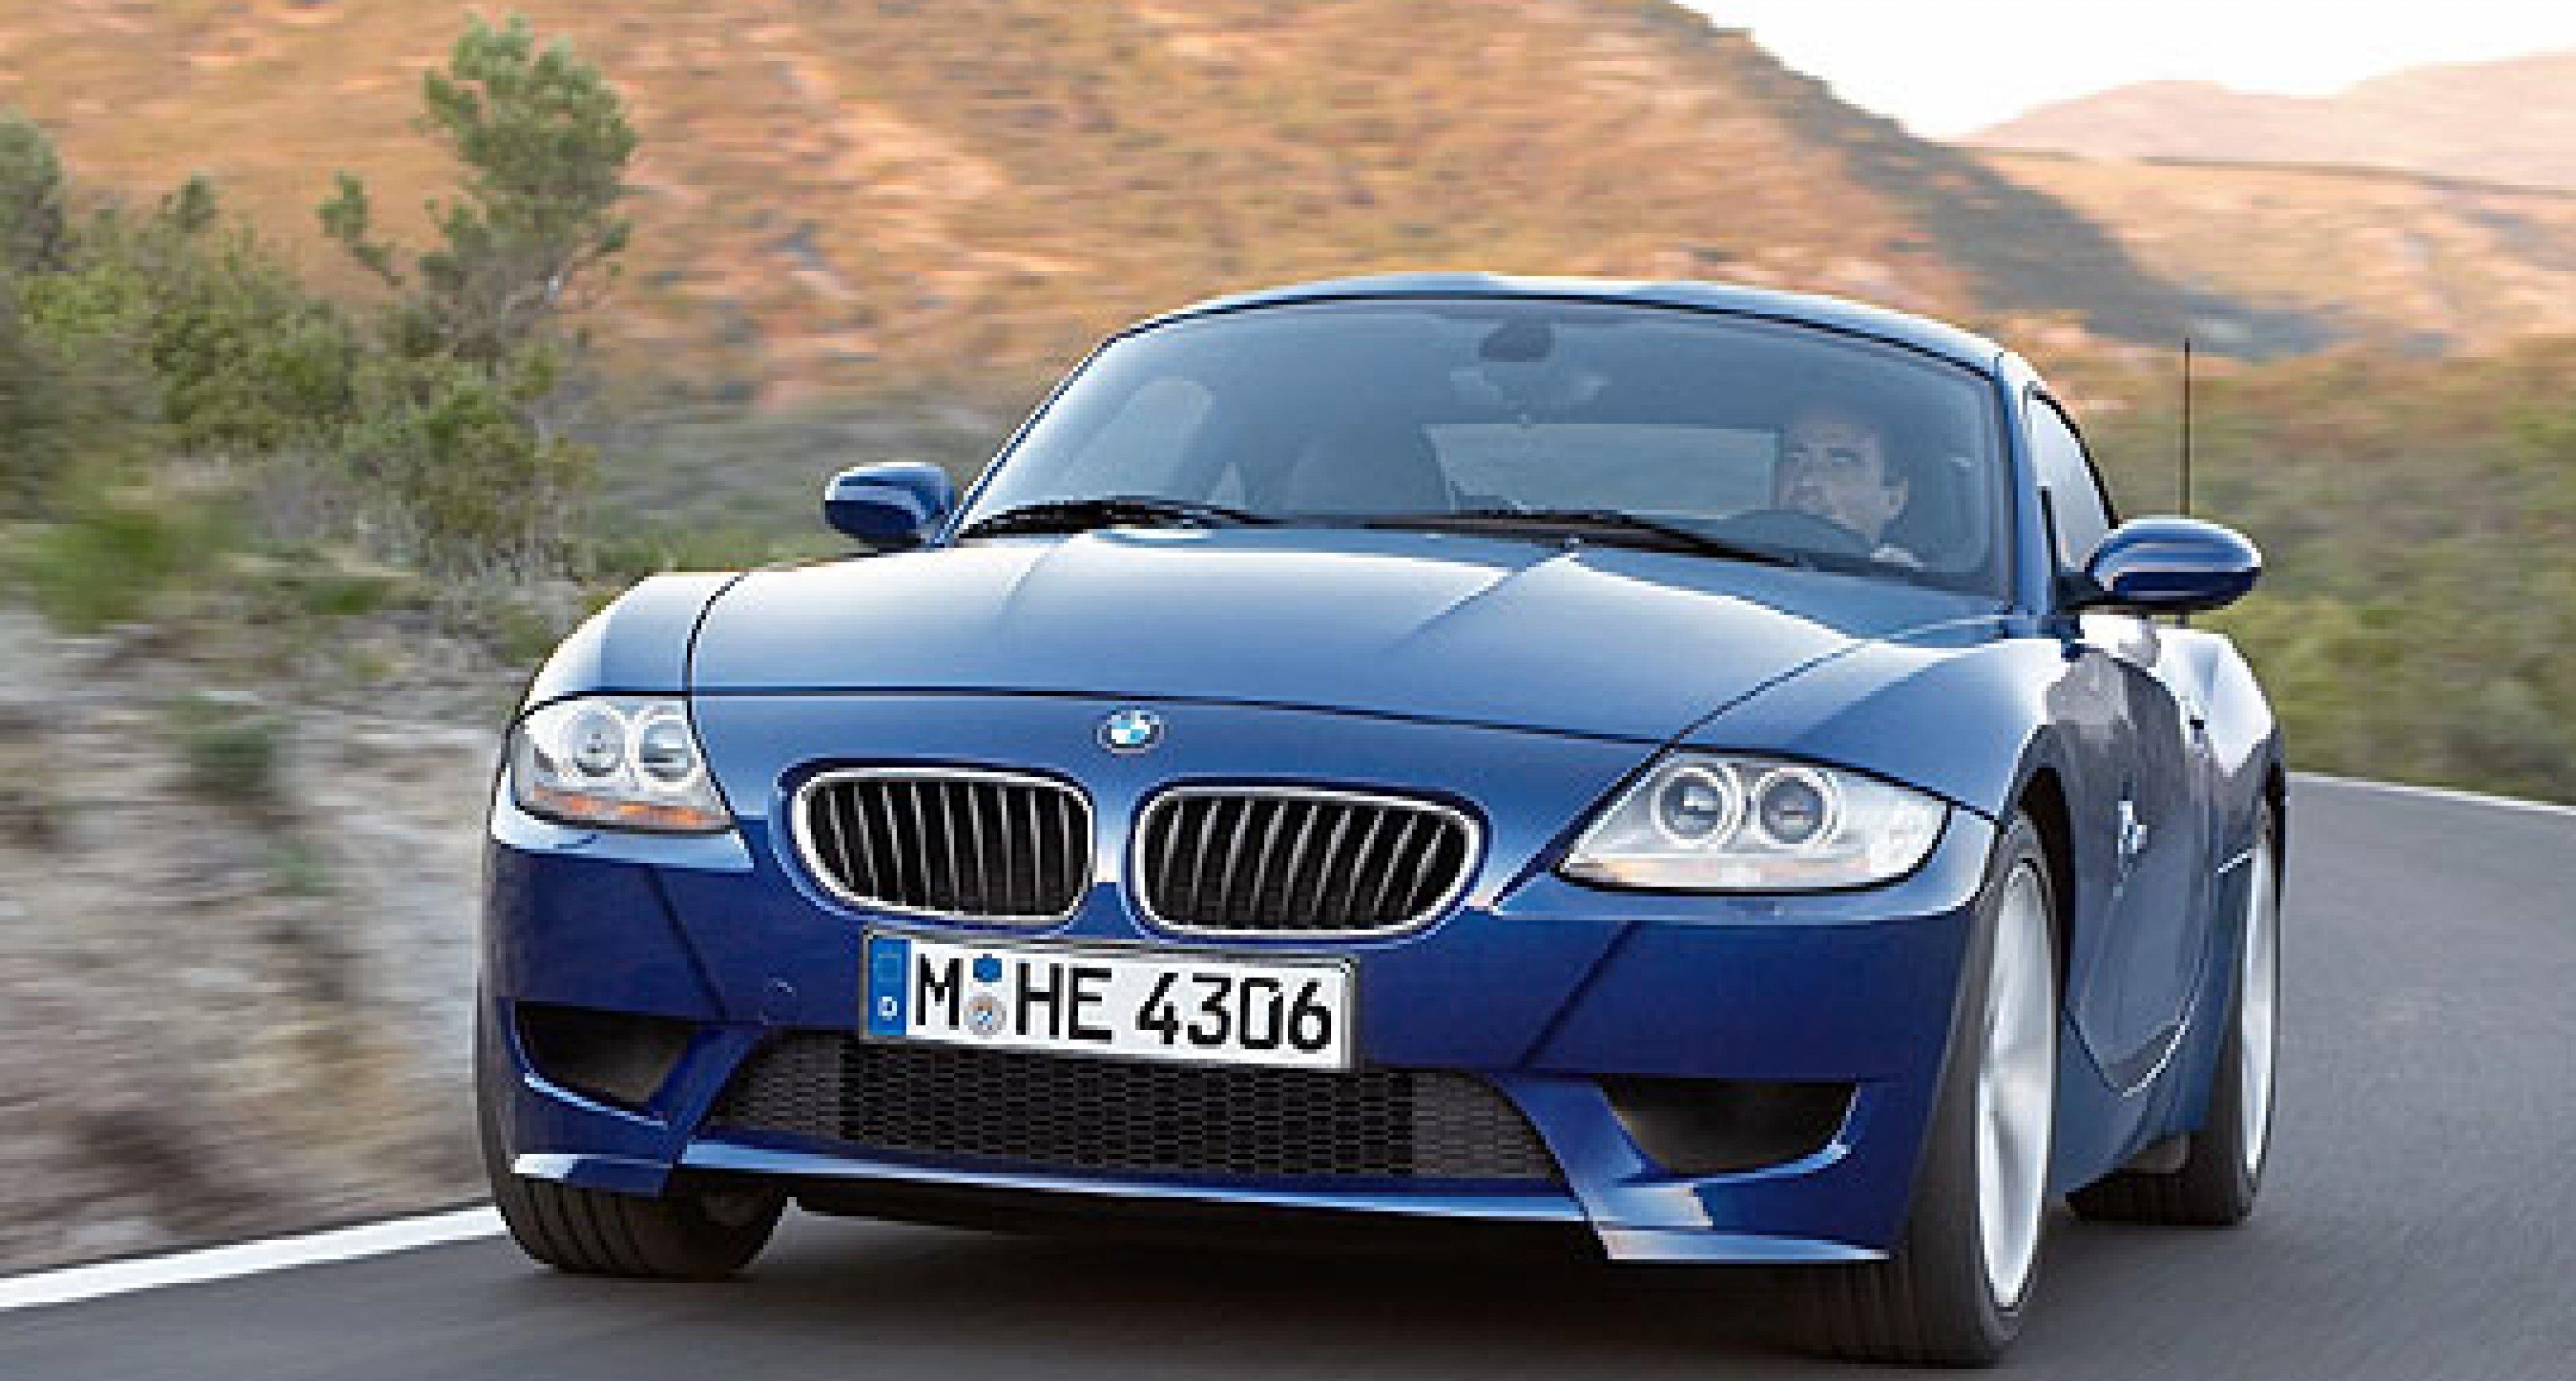 The new BMW Z4 Coupé